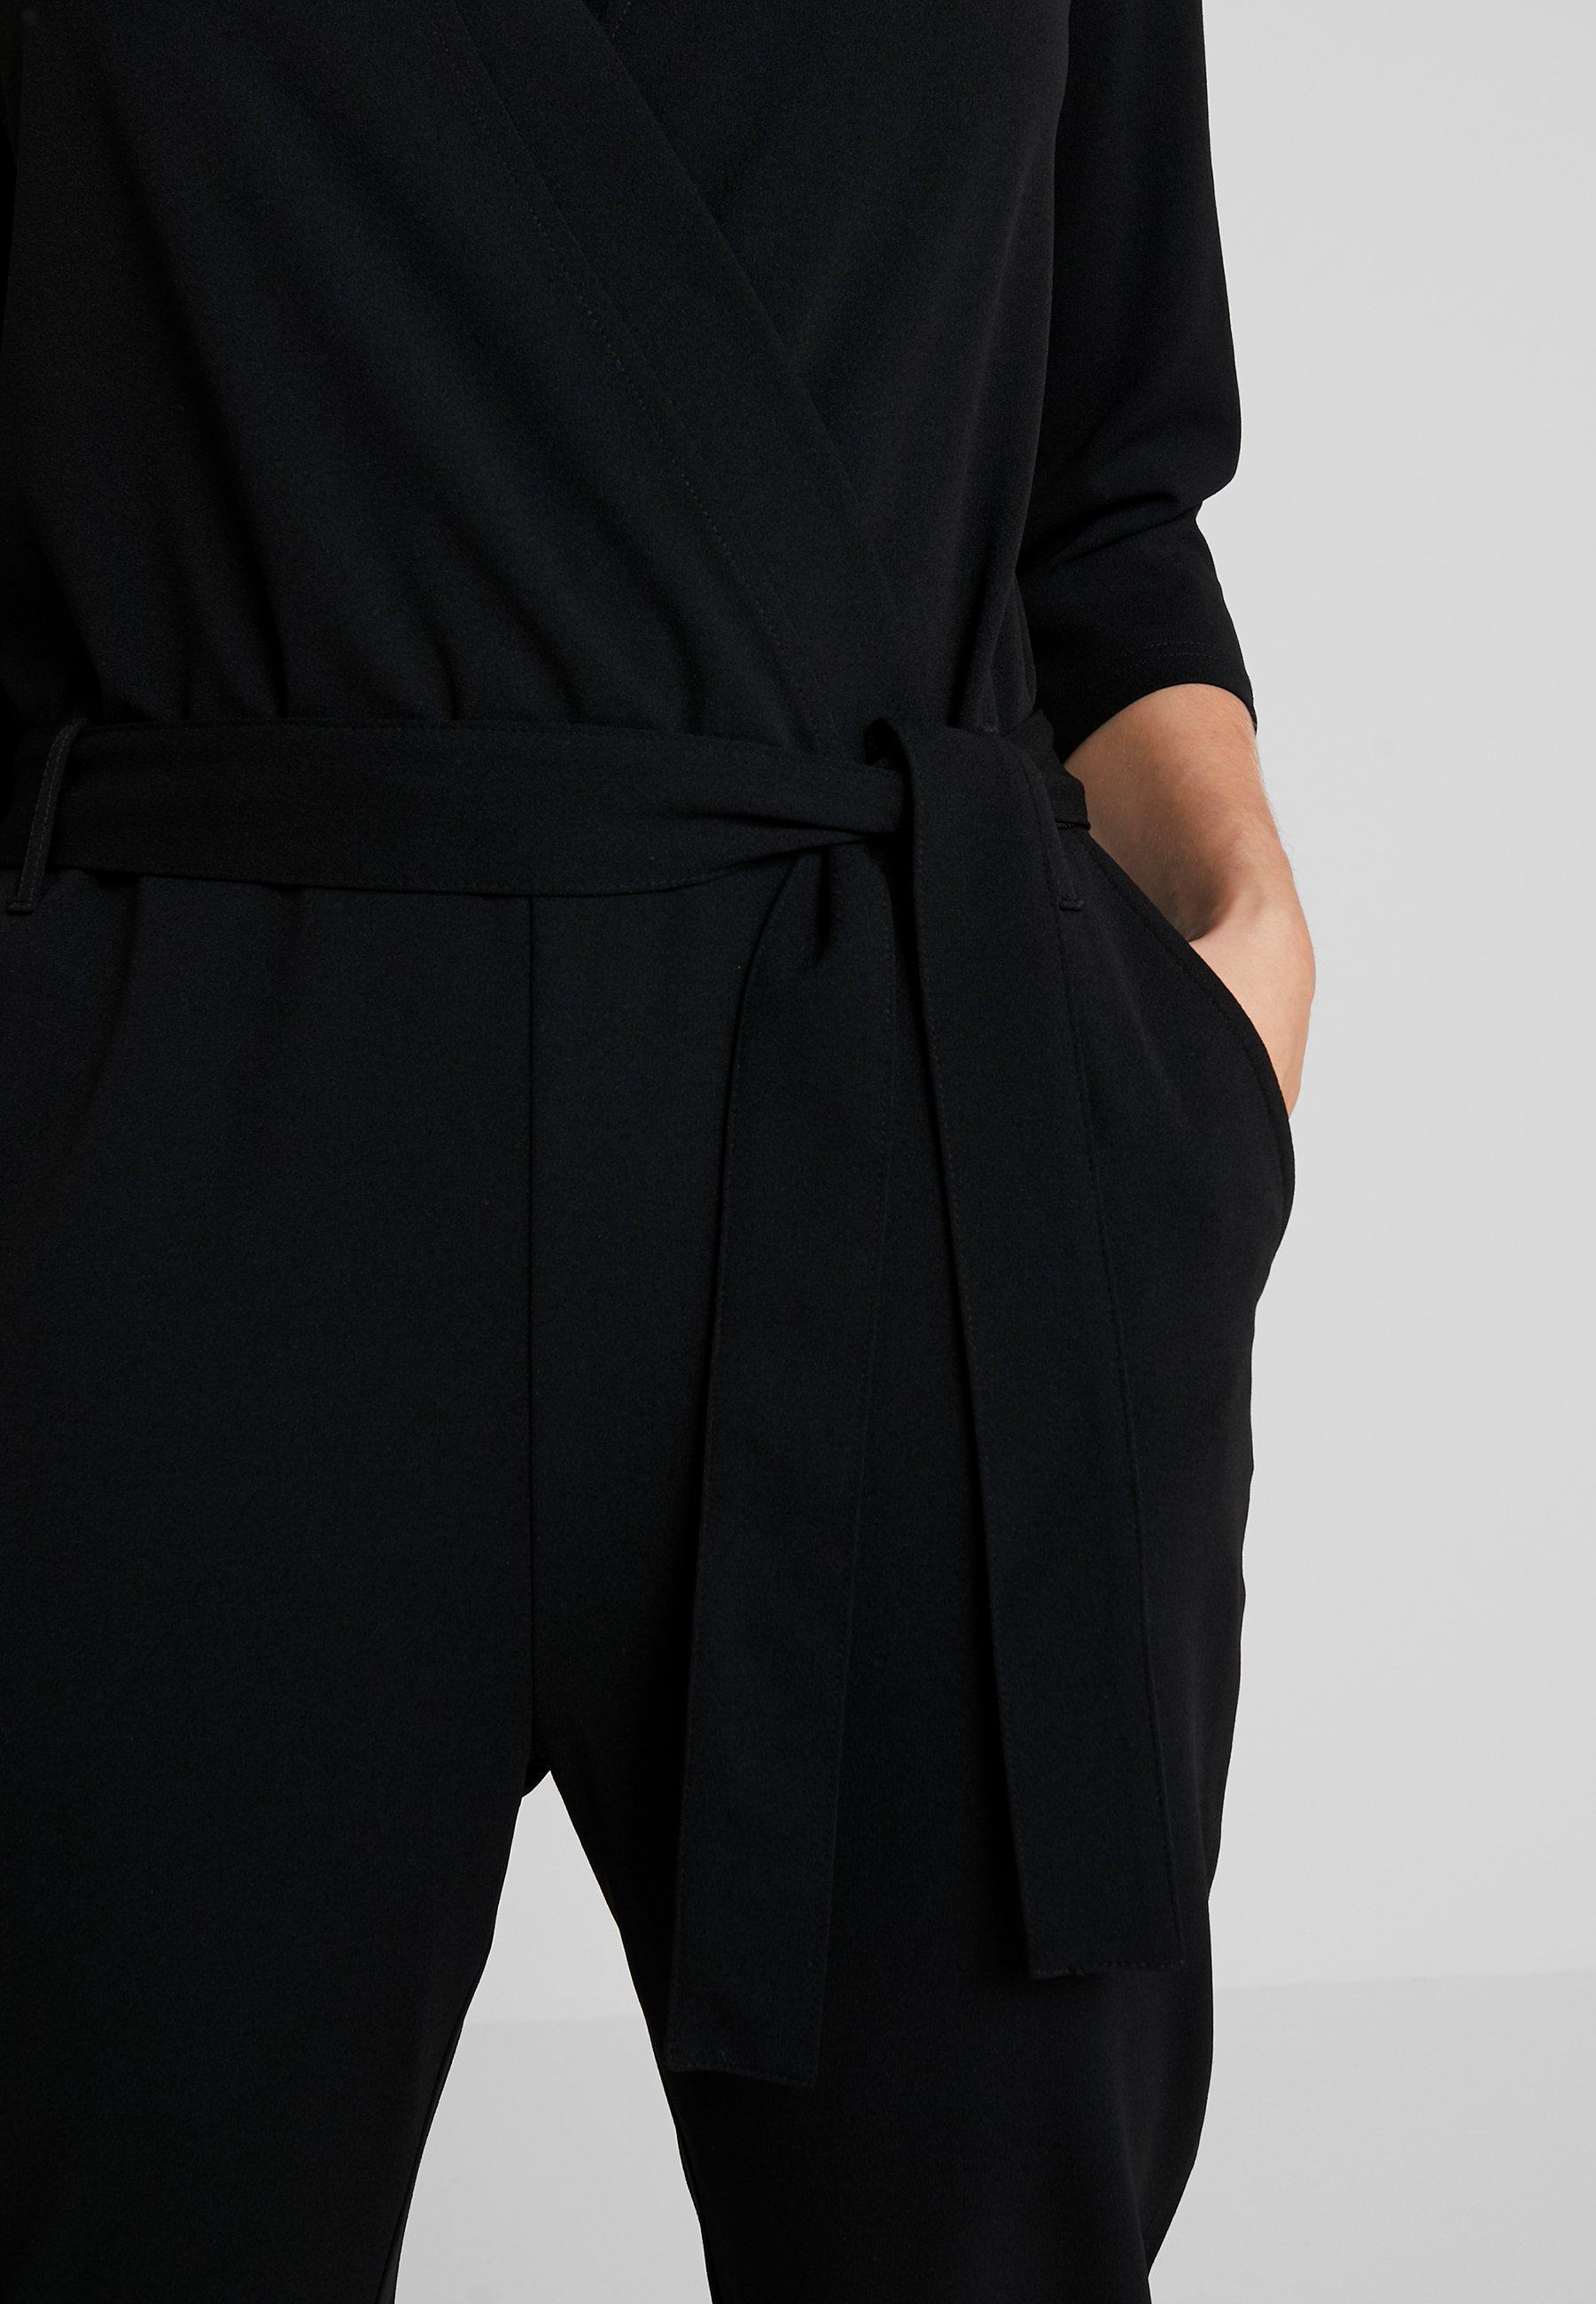 JDY JDYGEGGO - Tuta jumpsuit black